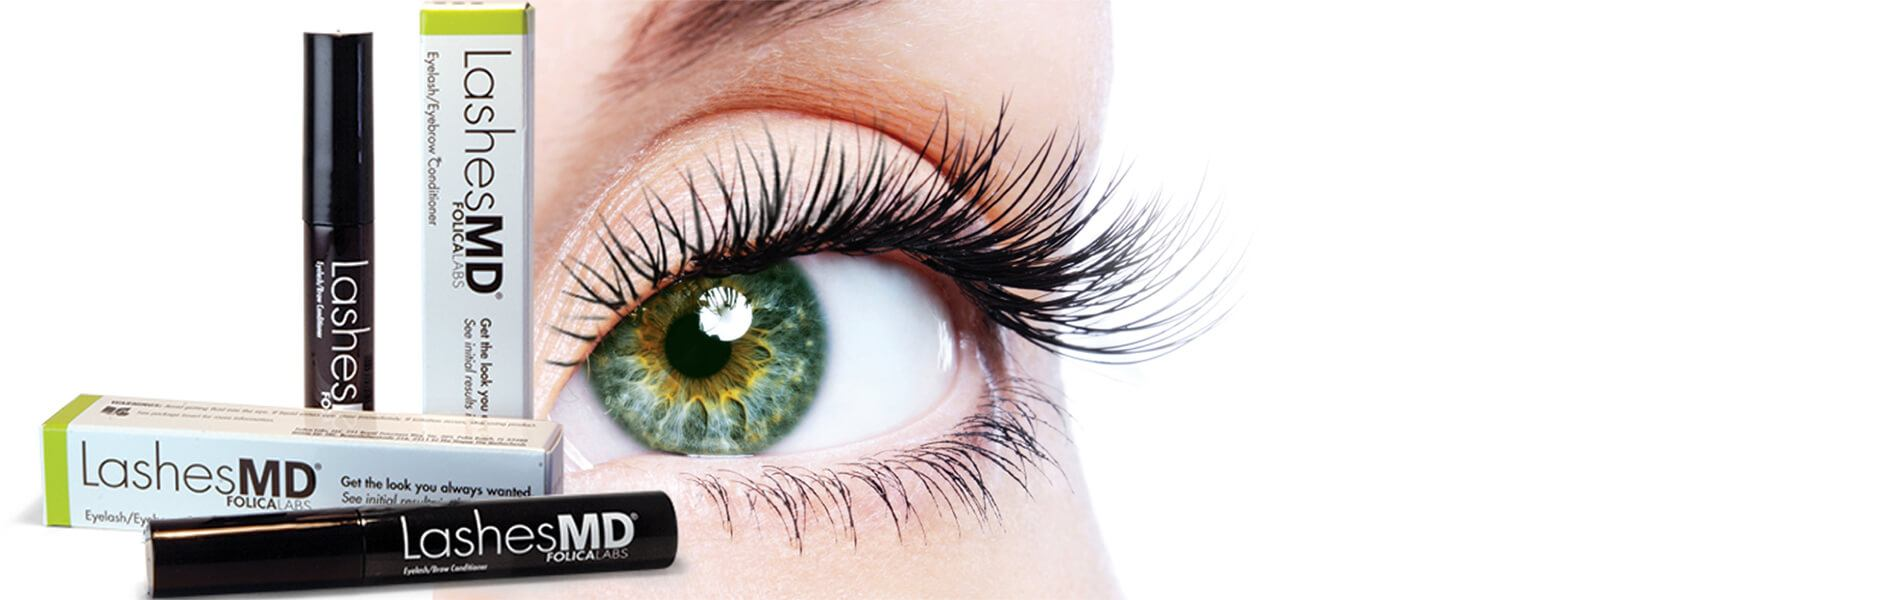 076d2166c2b Professional grade eyelash enhancer available without a prescription.